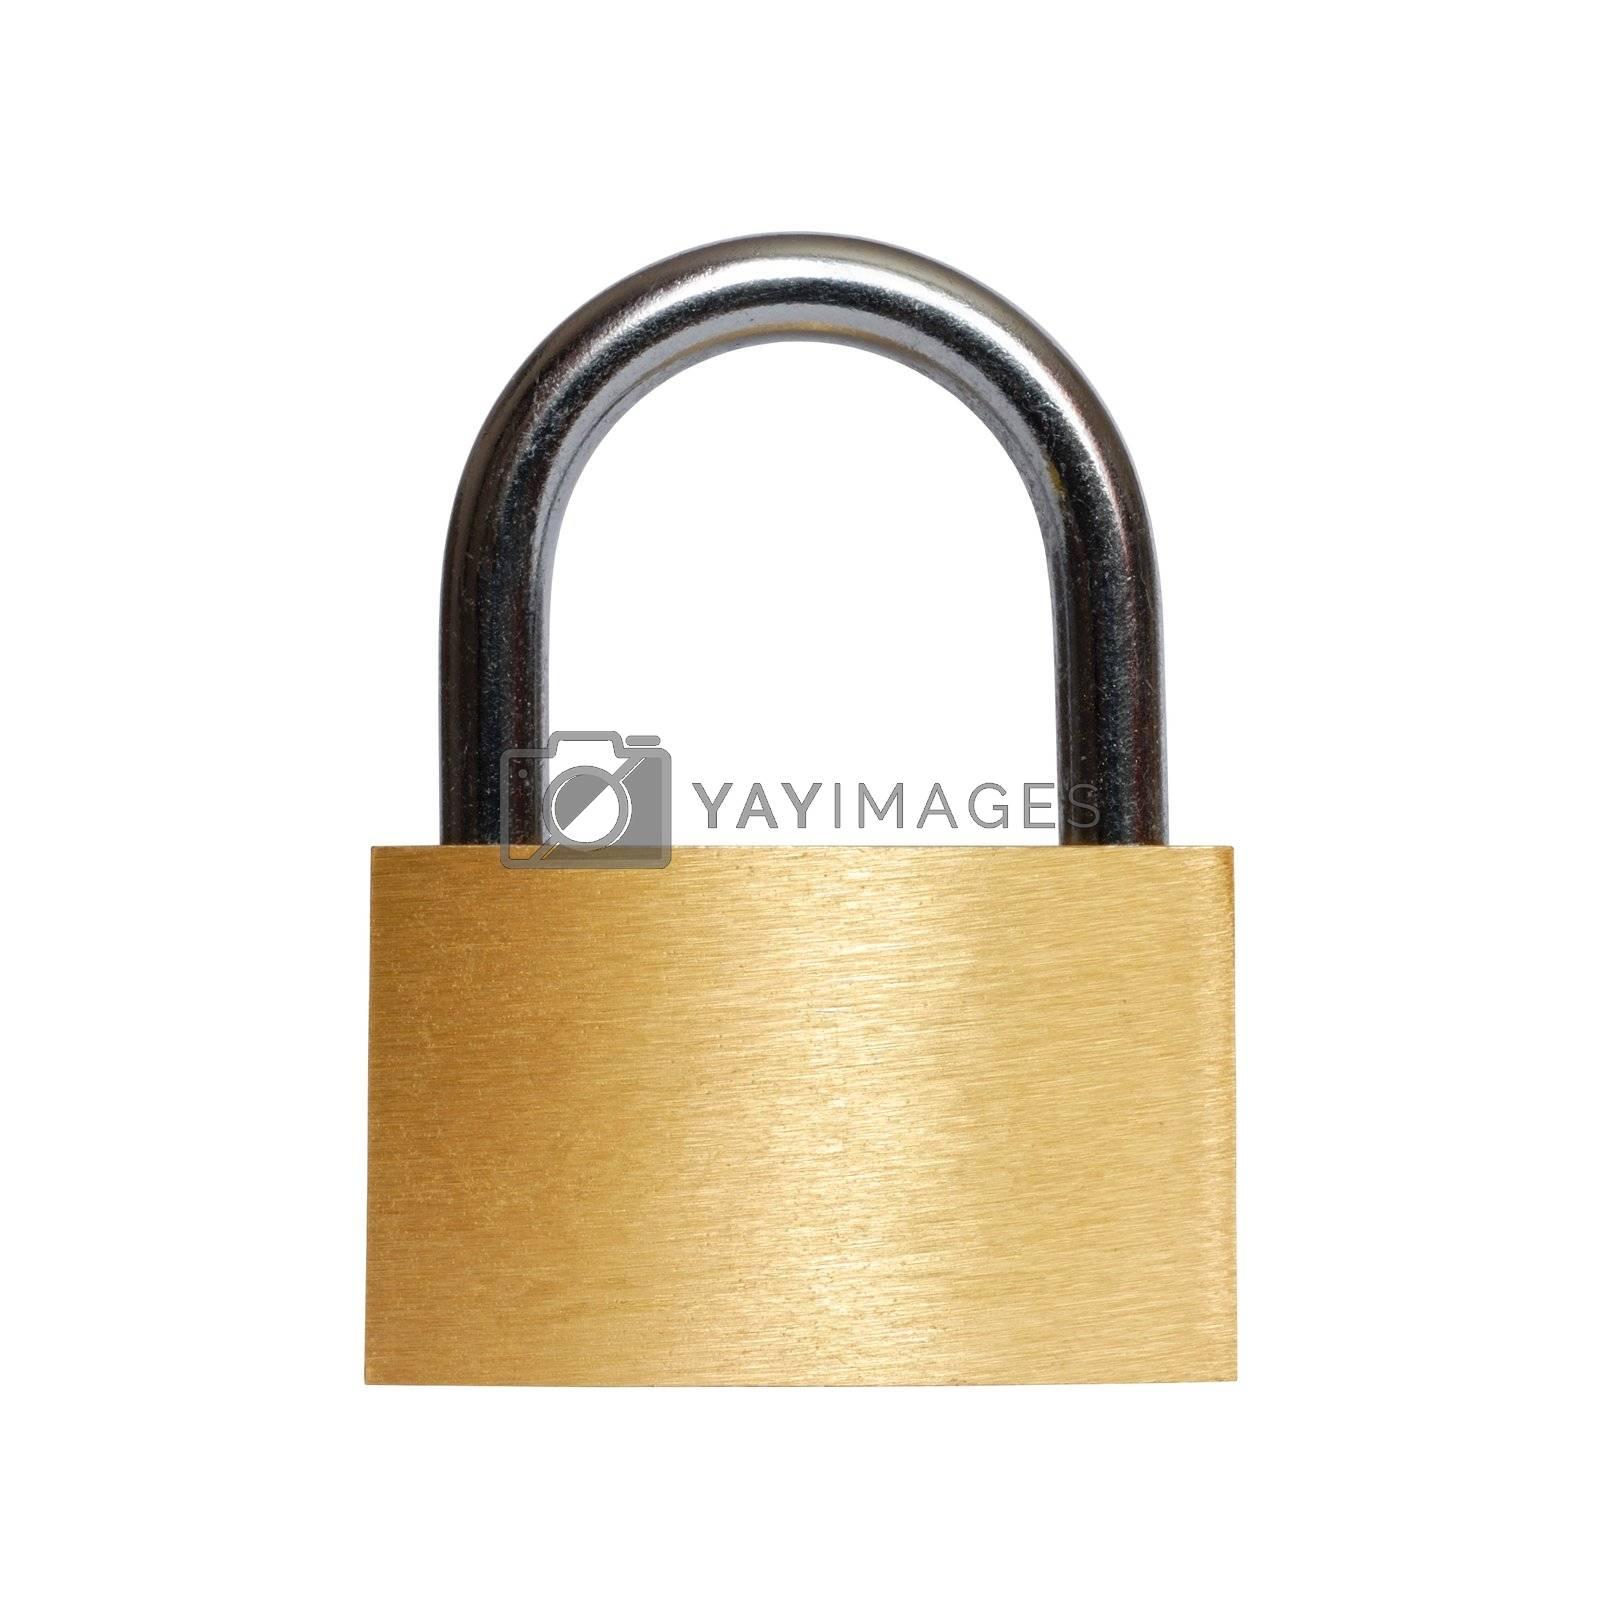 Isolated closed padlock